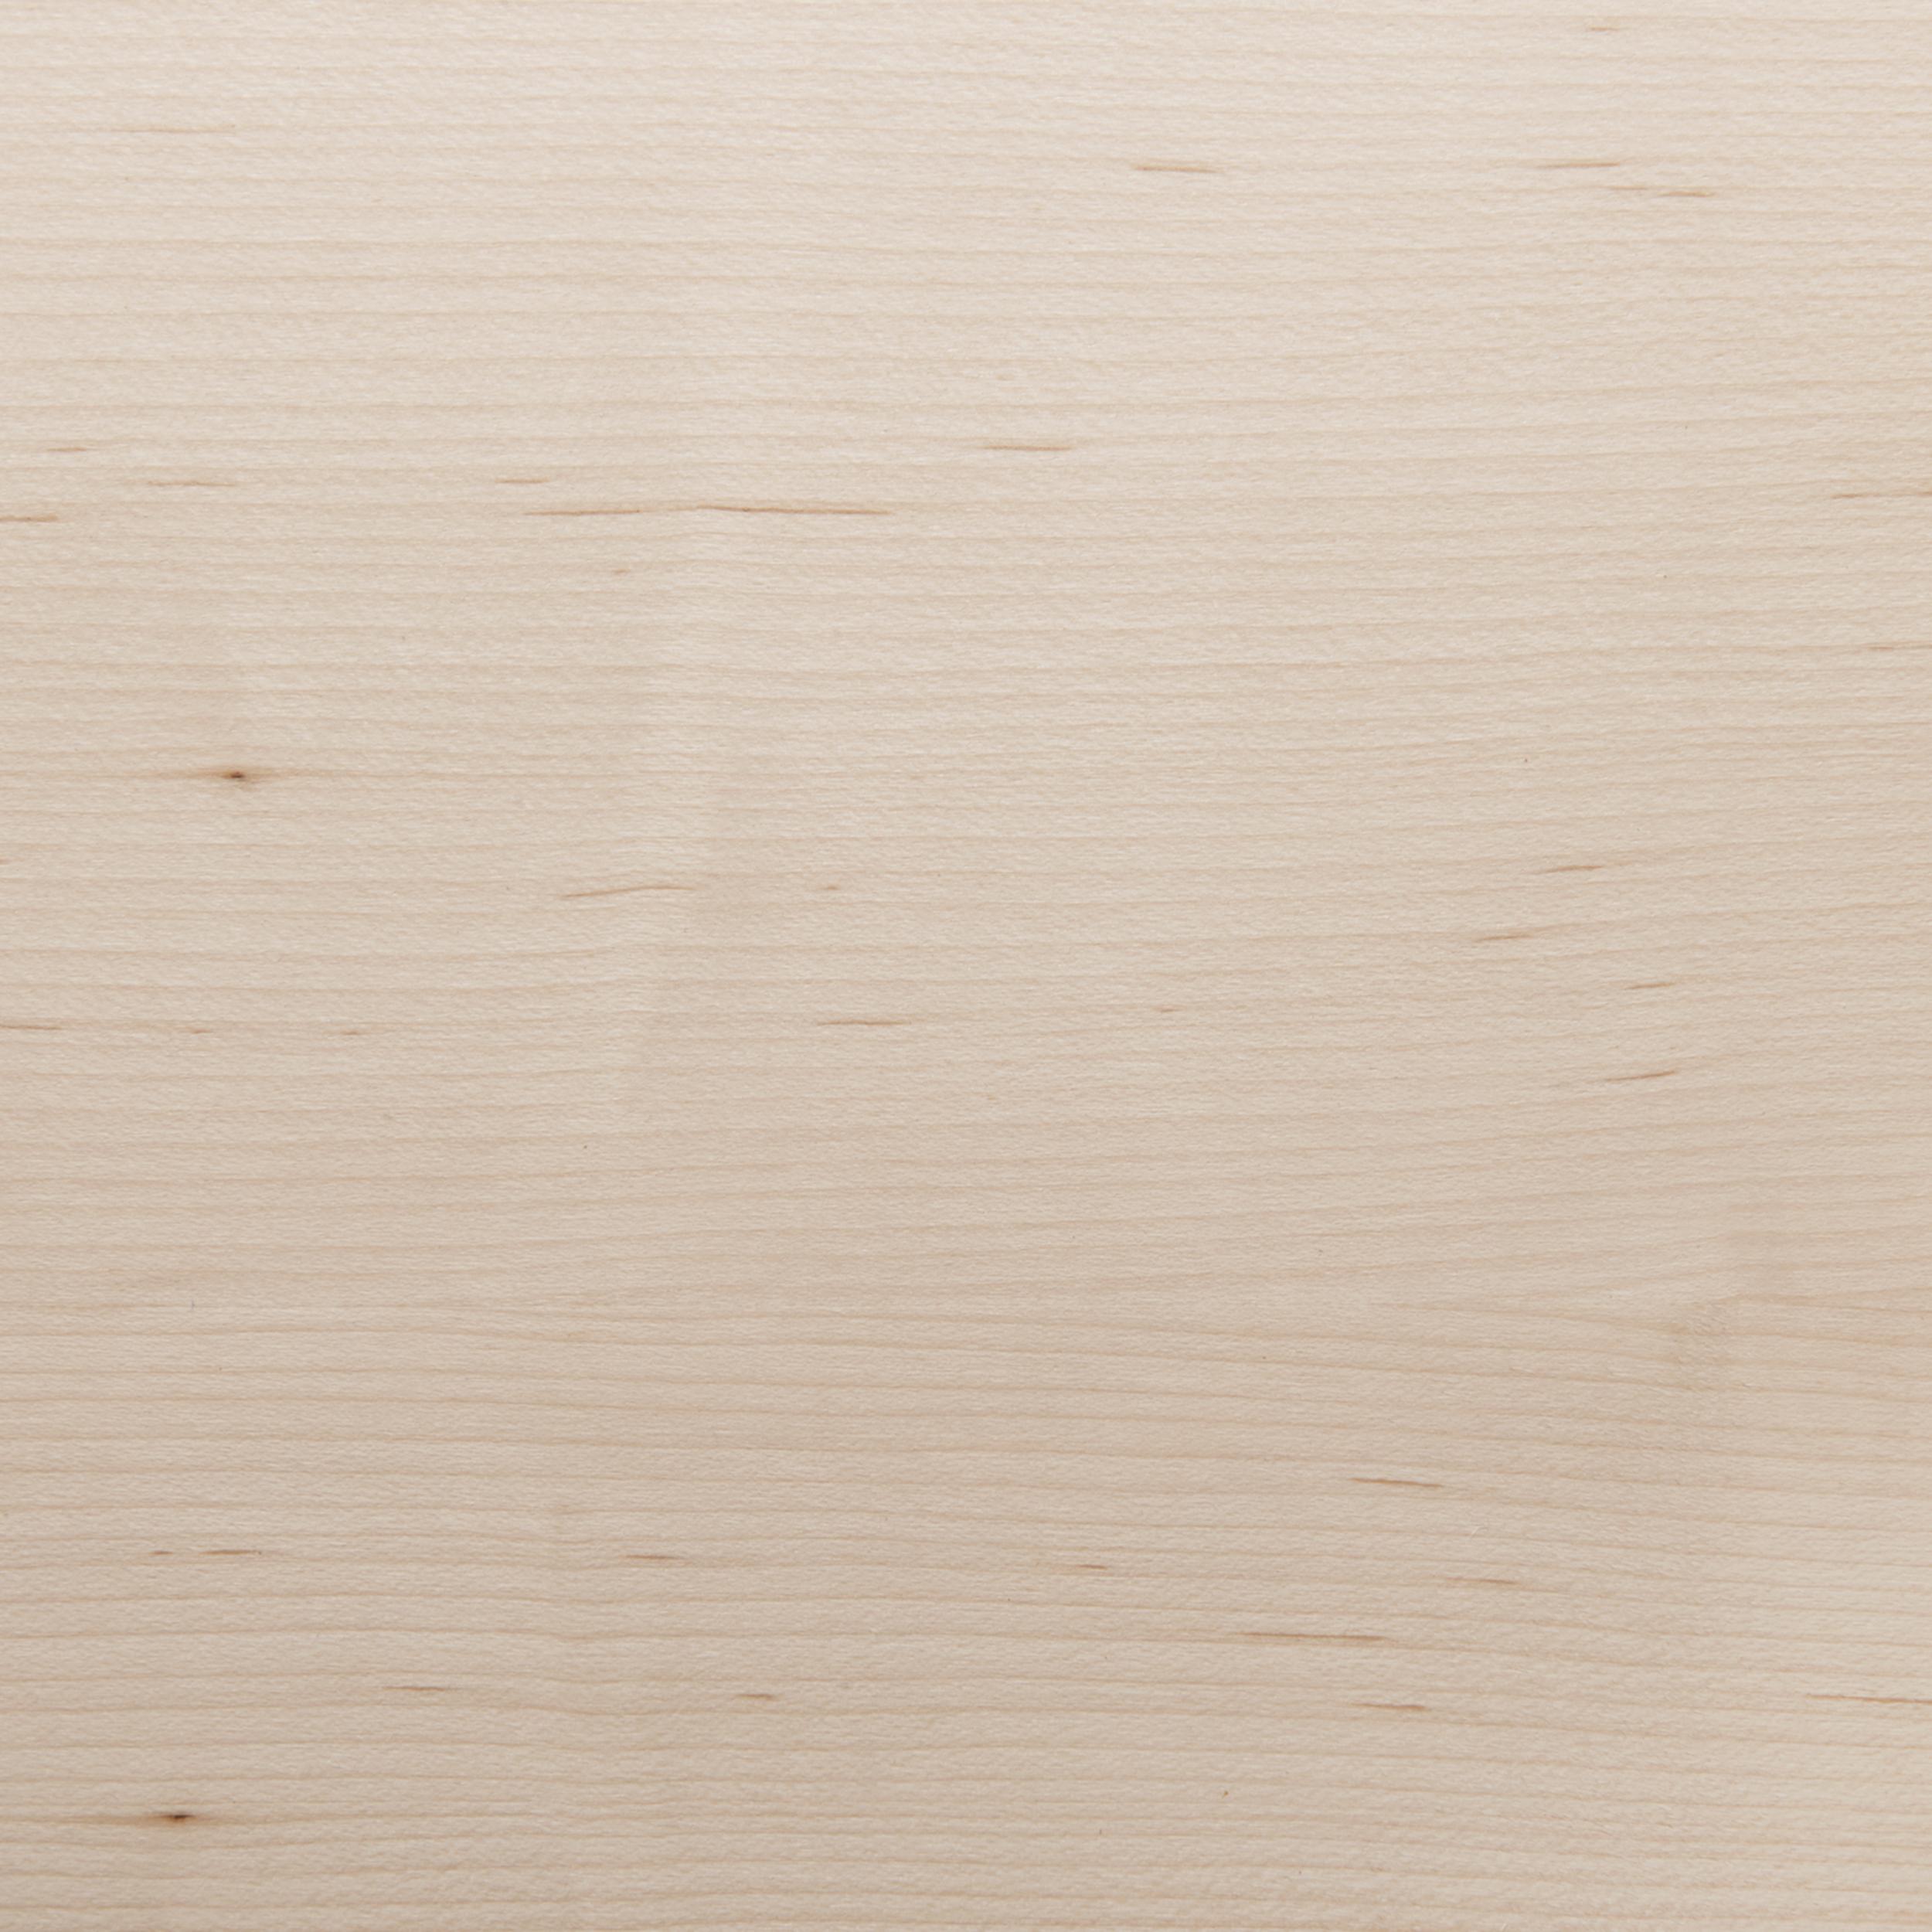 Maple, Quartersawn 4'X8' Veneer Sheet, 10MIL Paper Backed